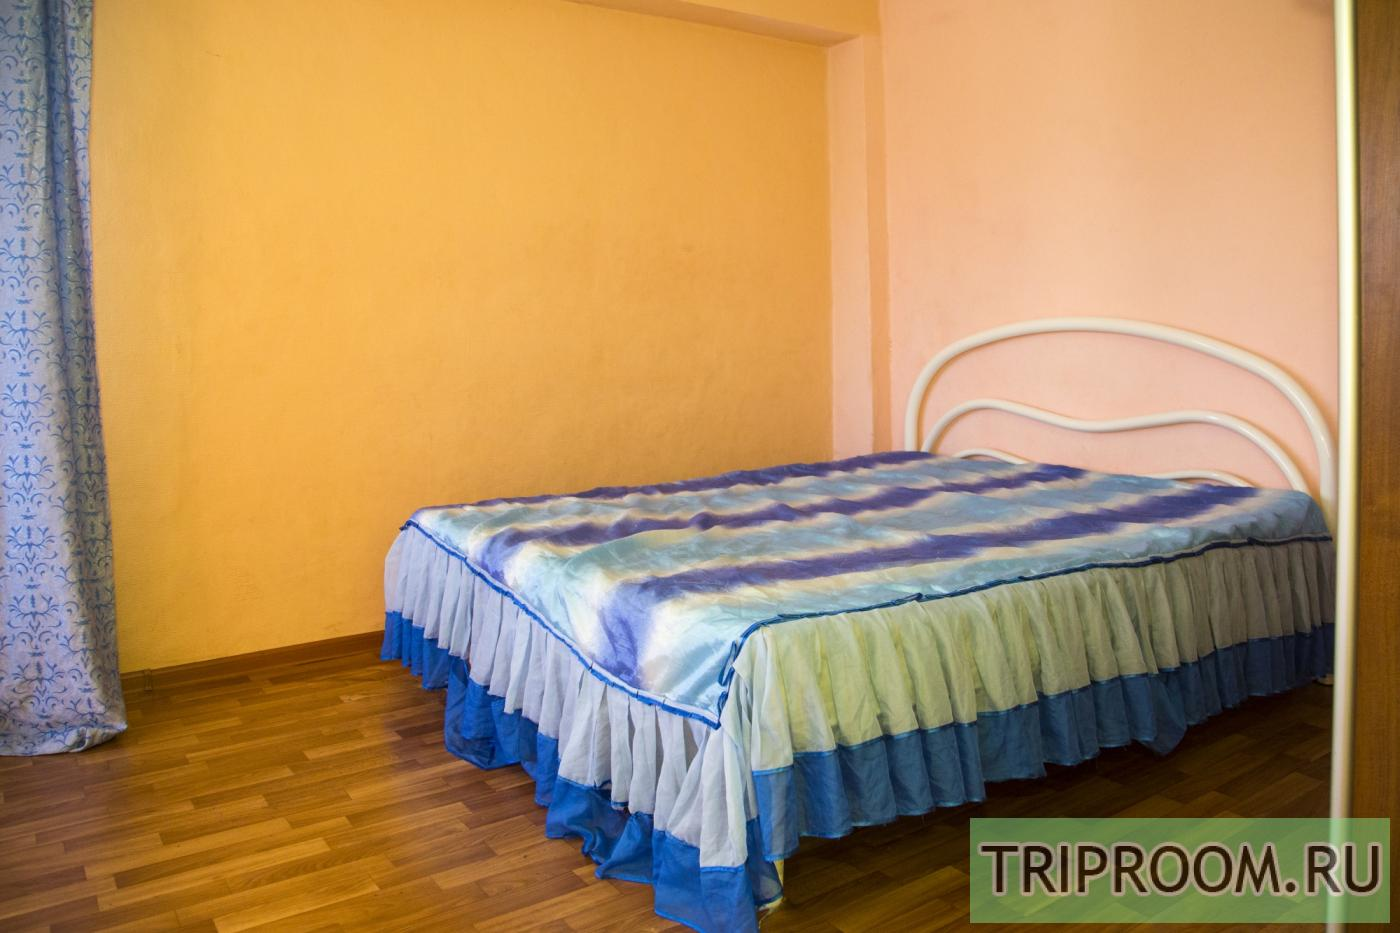 1-комнатная квартира посуточно (вариант № 6615), ул. Александра Матросова улица, фото № 4